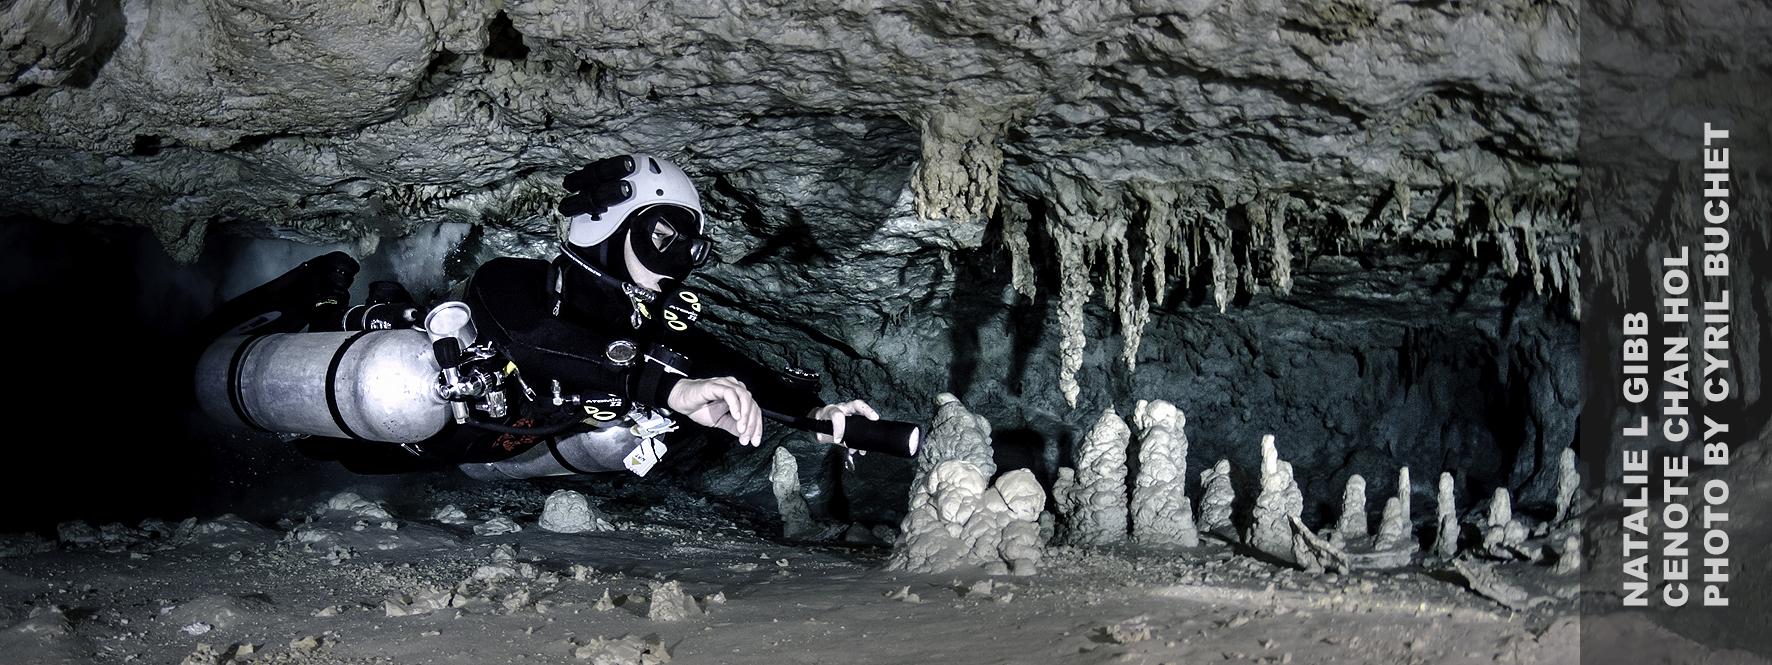 Natalie Gibb, Natalie Cave Diver, Natalie Mexico, Under the Jungle, Natalie Cave Explorer